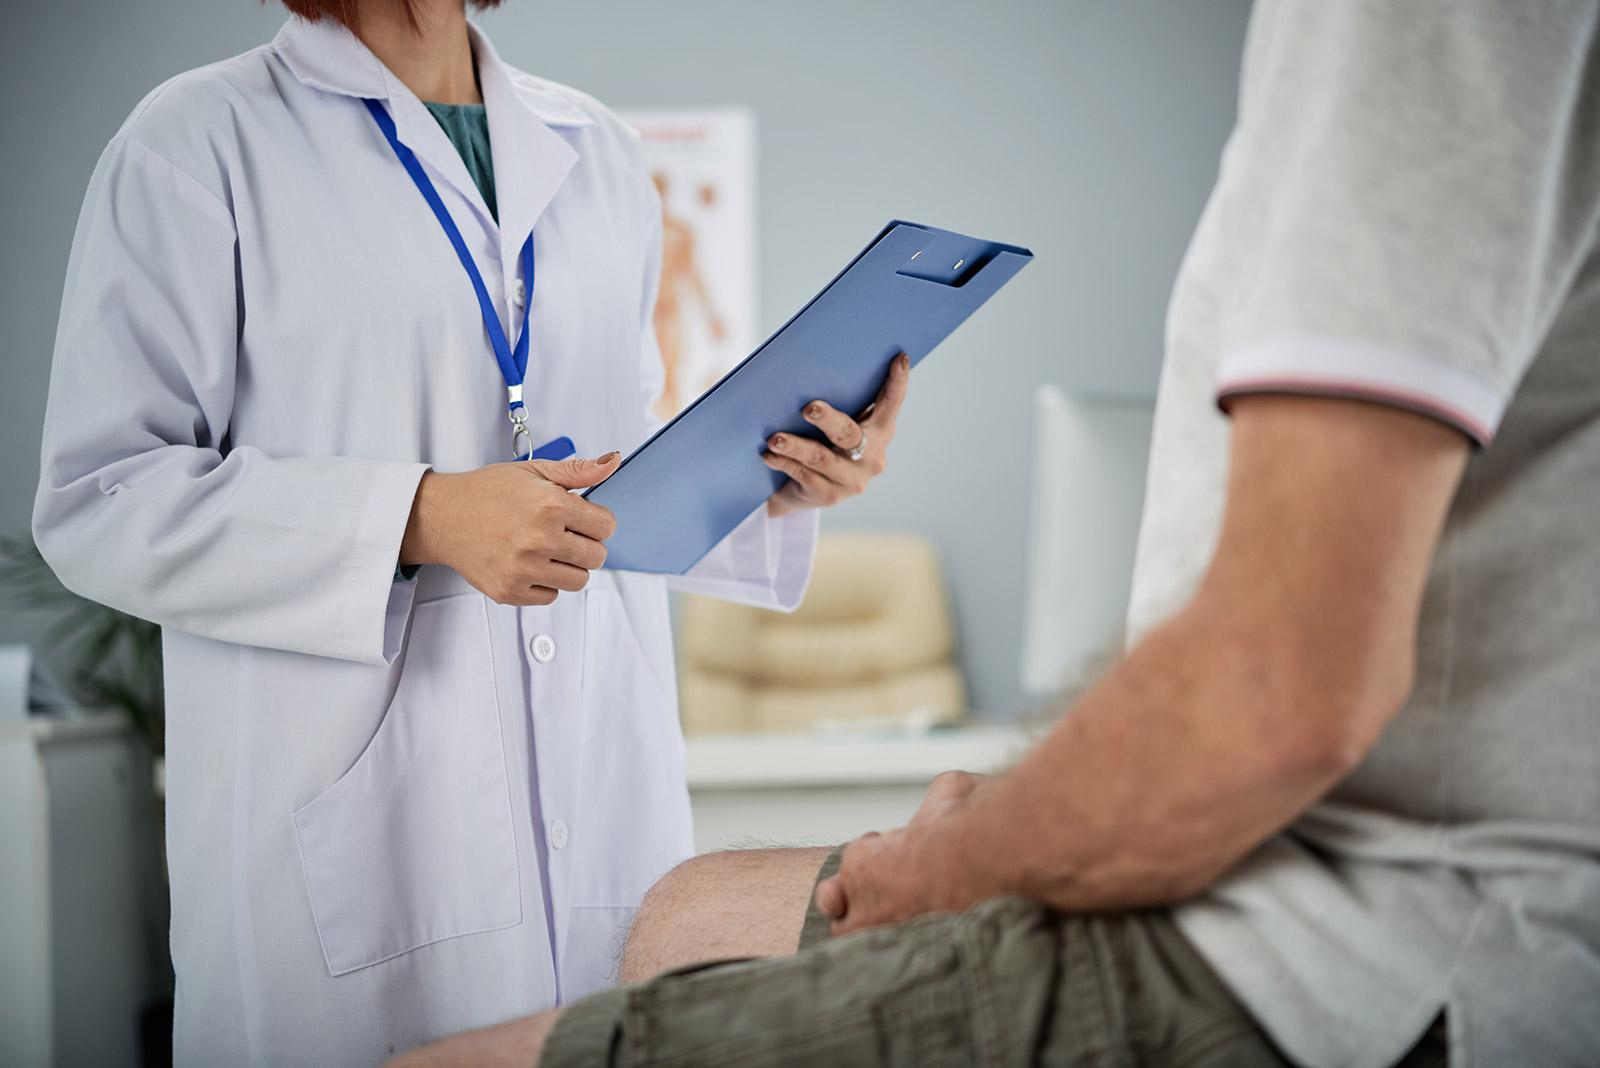 Medical exam weight loss clinic Burbank